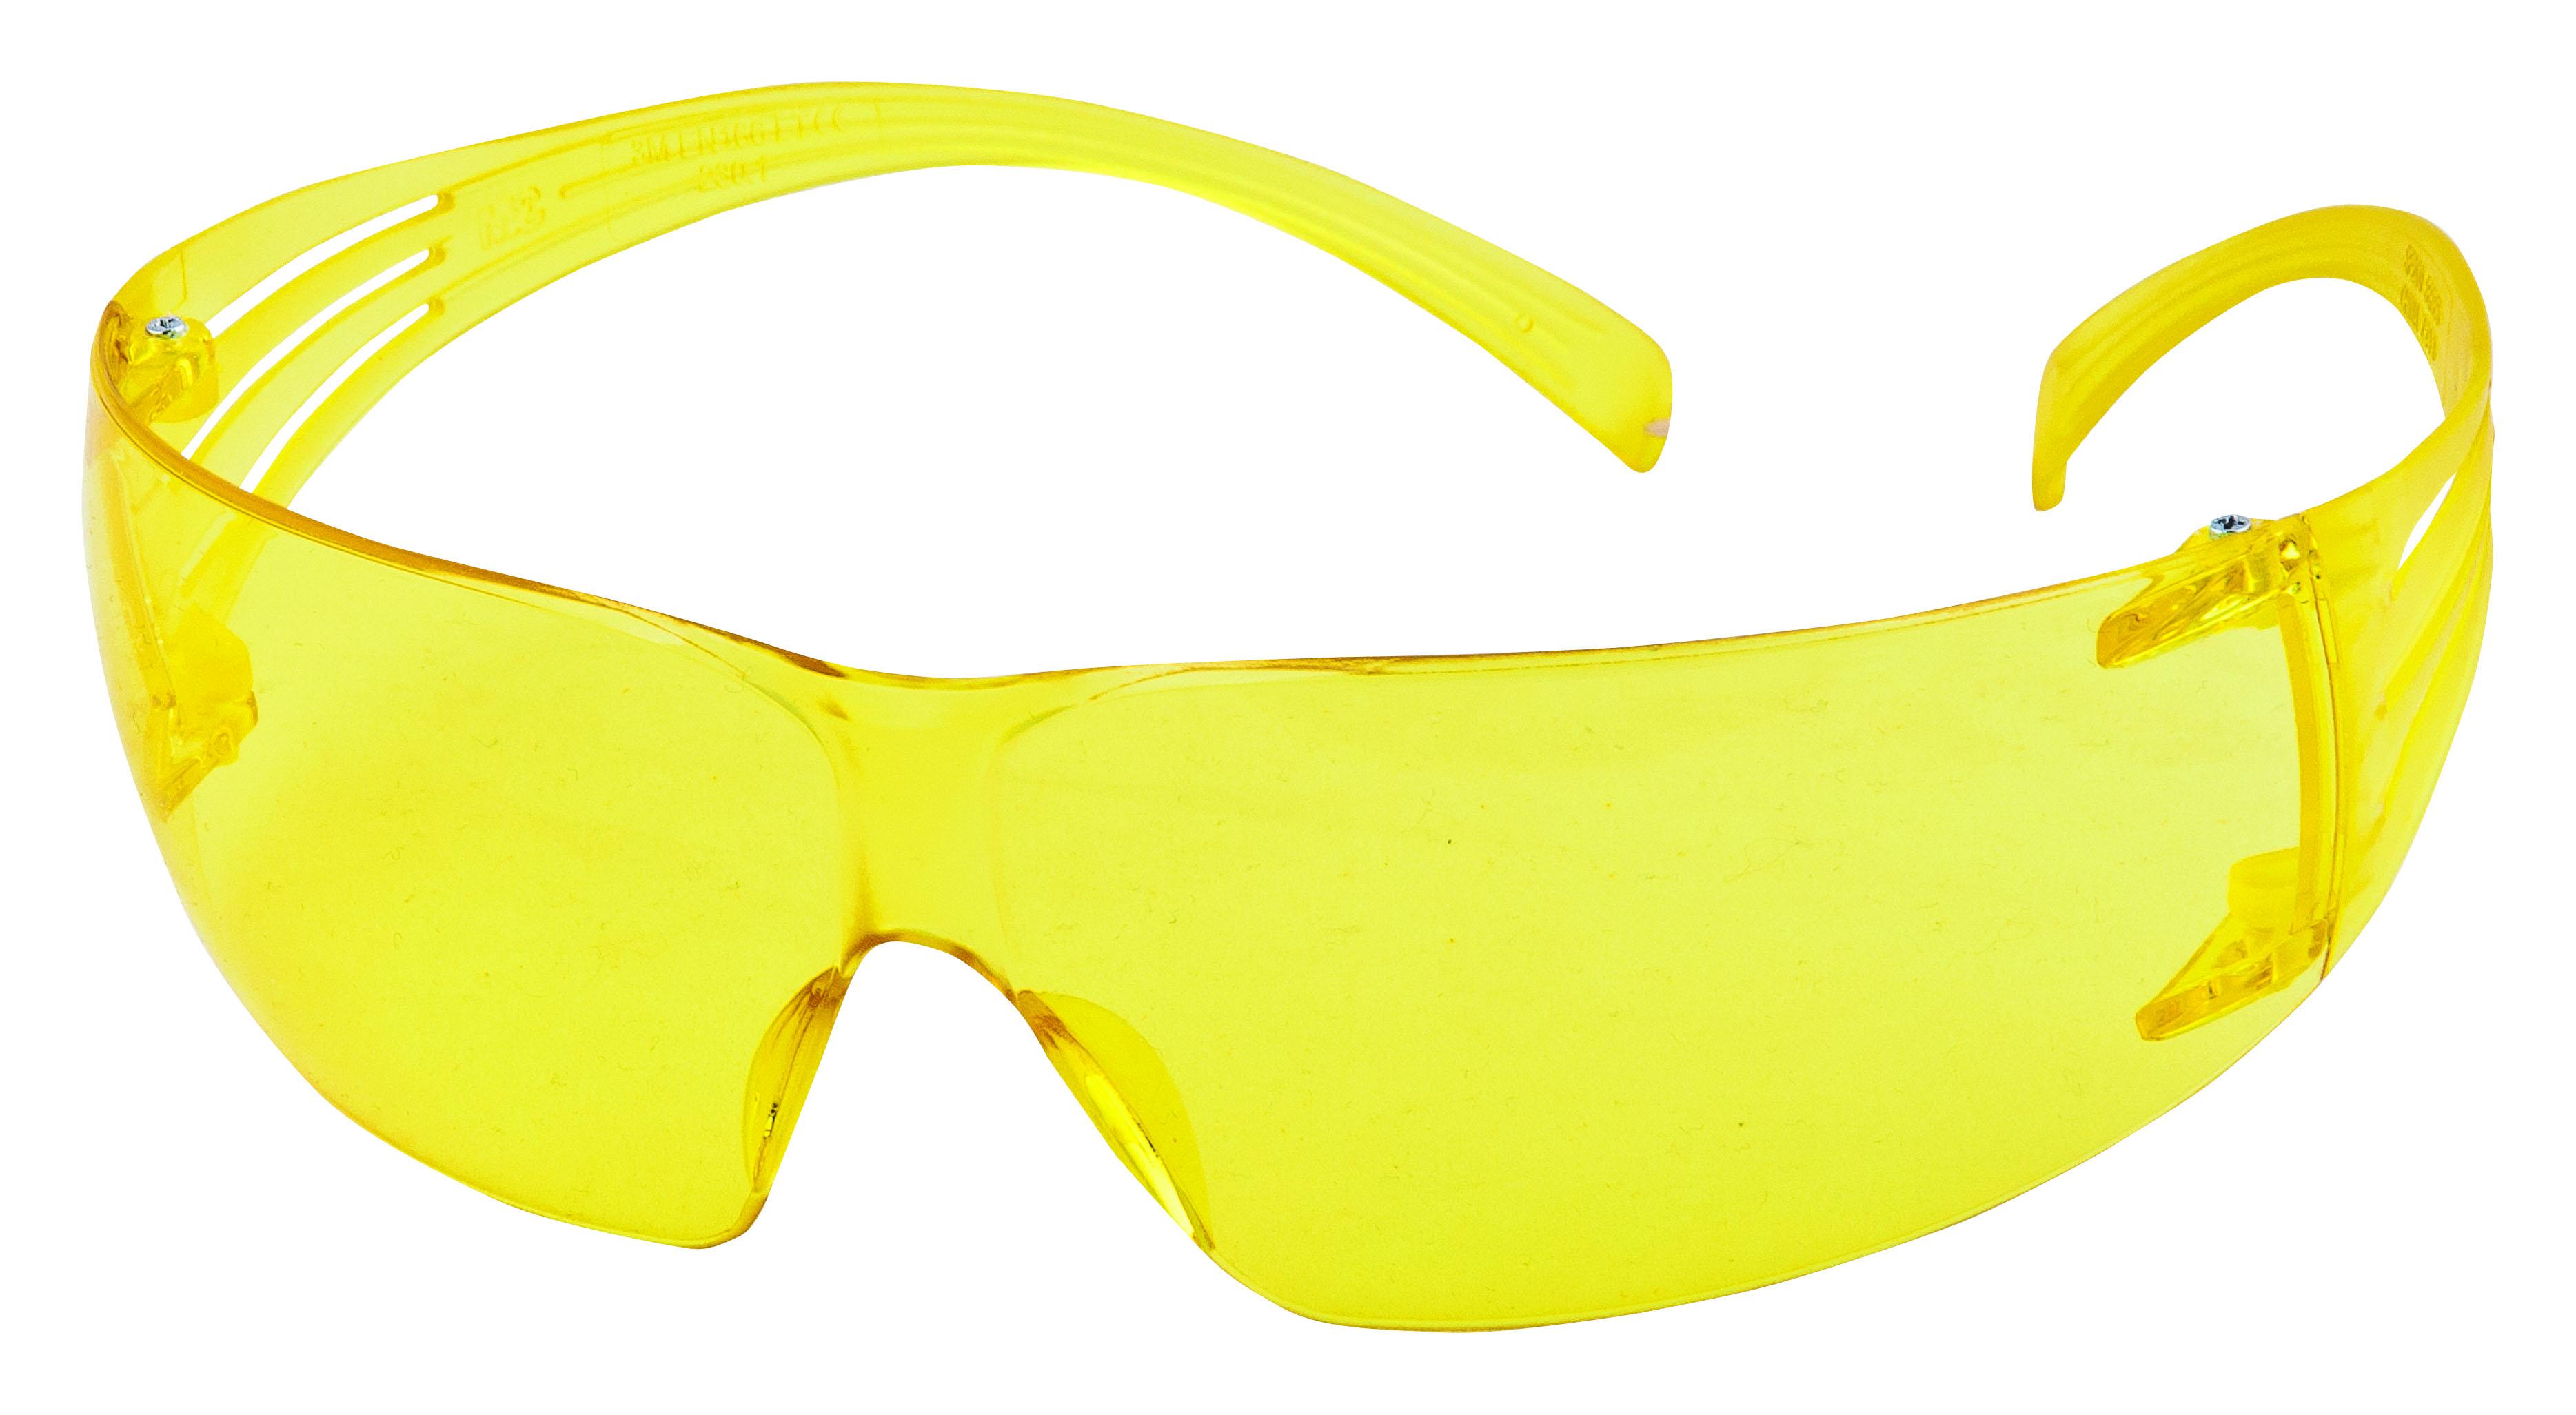 SF203AF-EU, Žluté polykarb. brýle SecureFit, povrch AS/AF